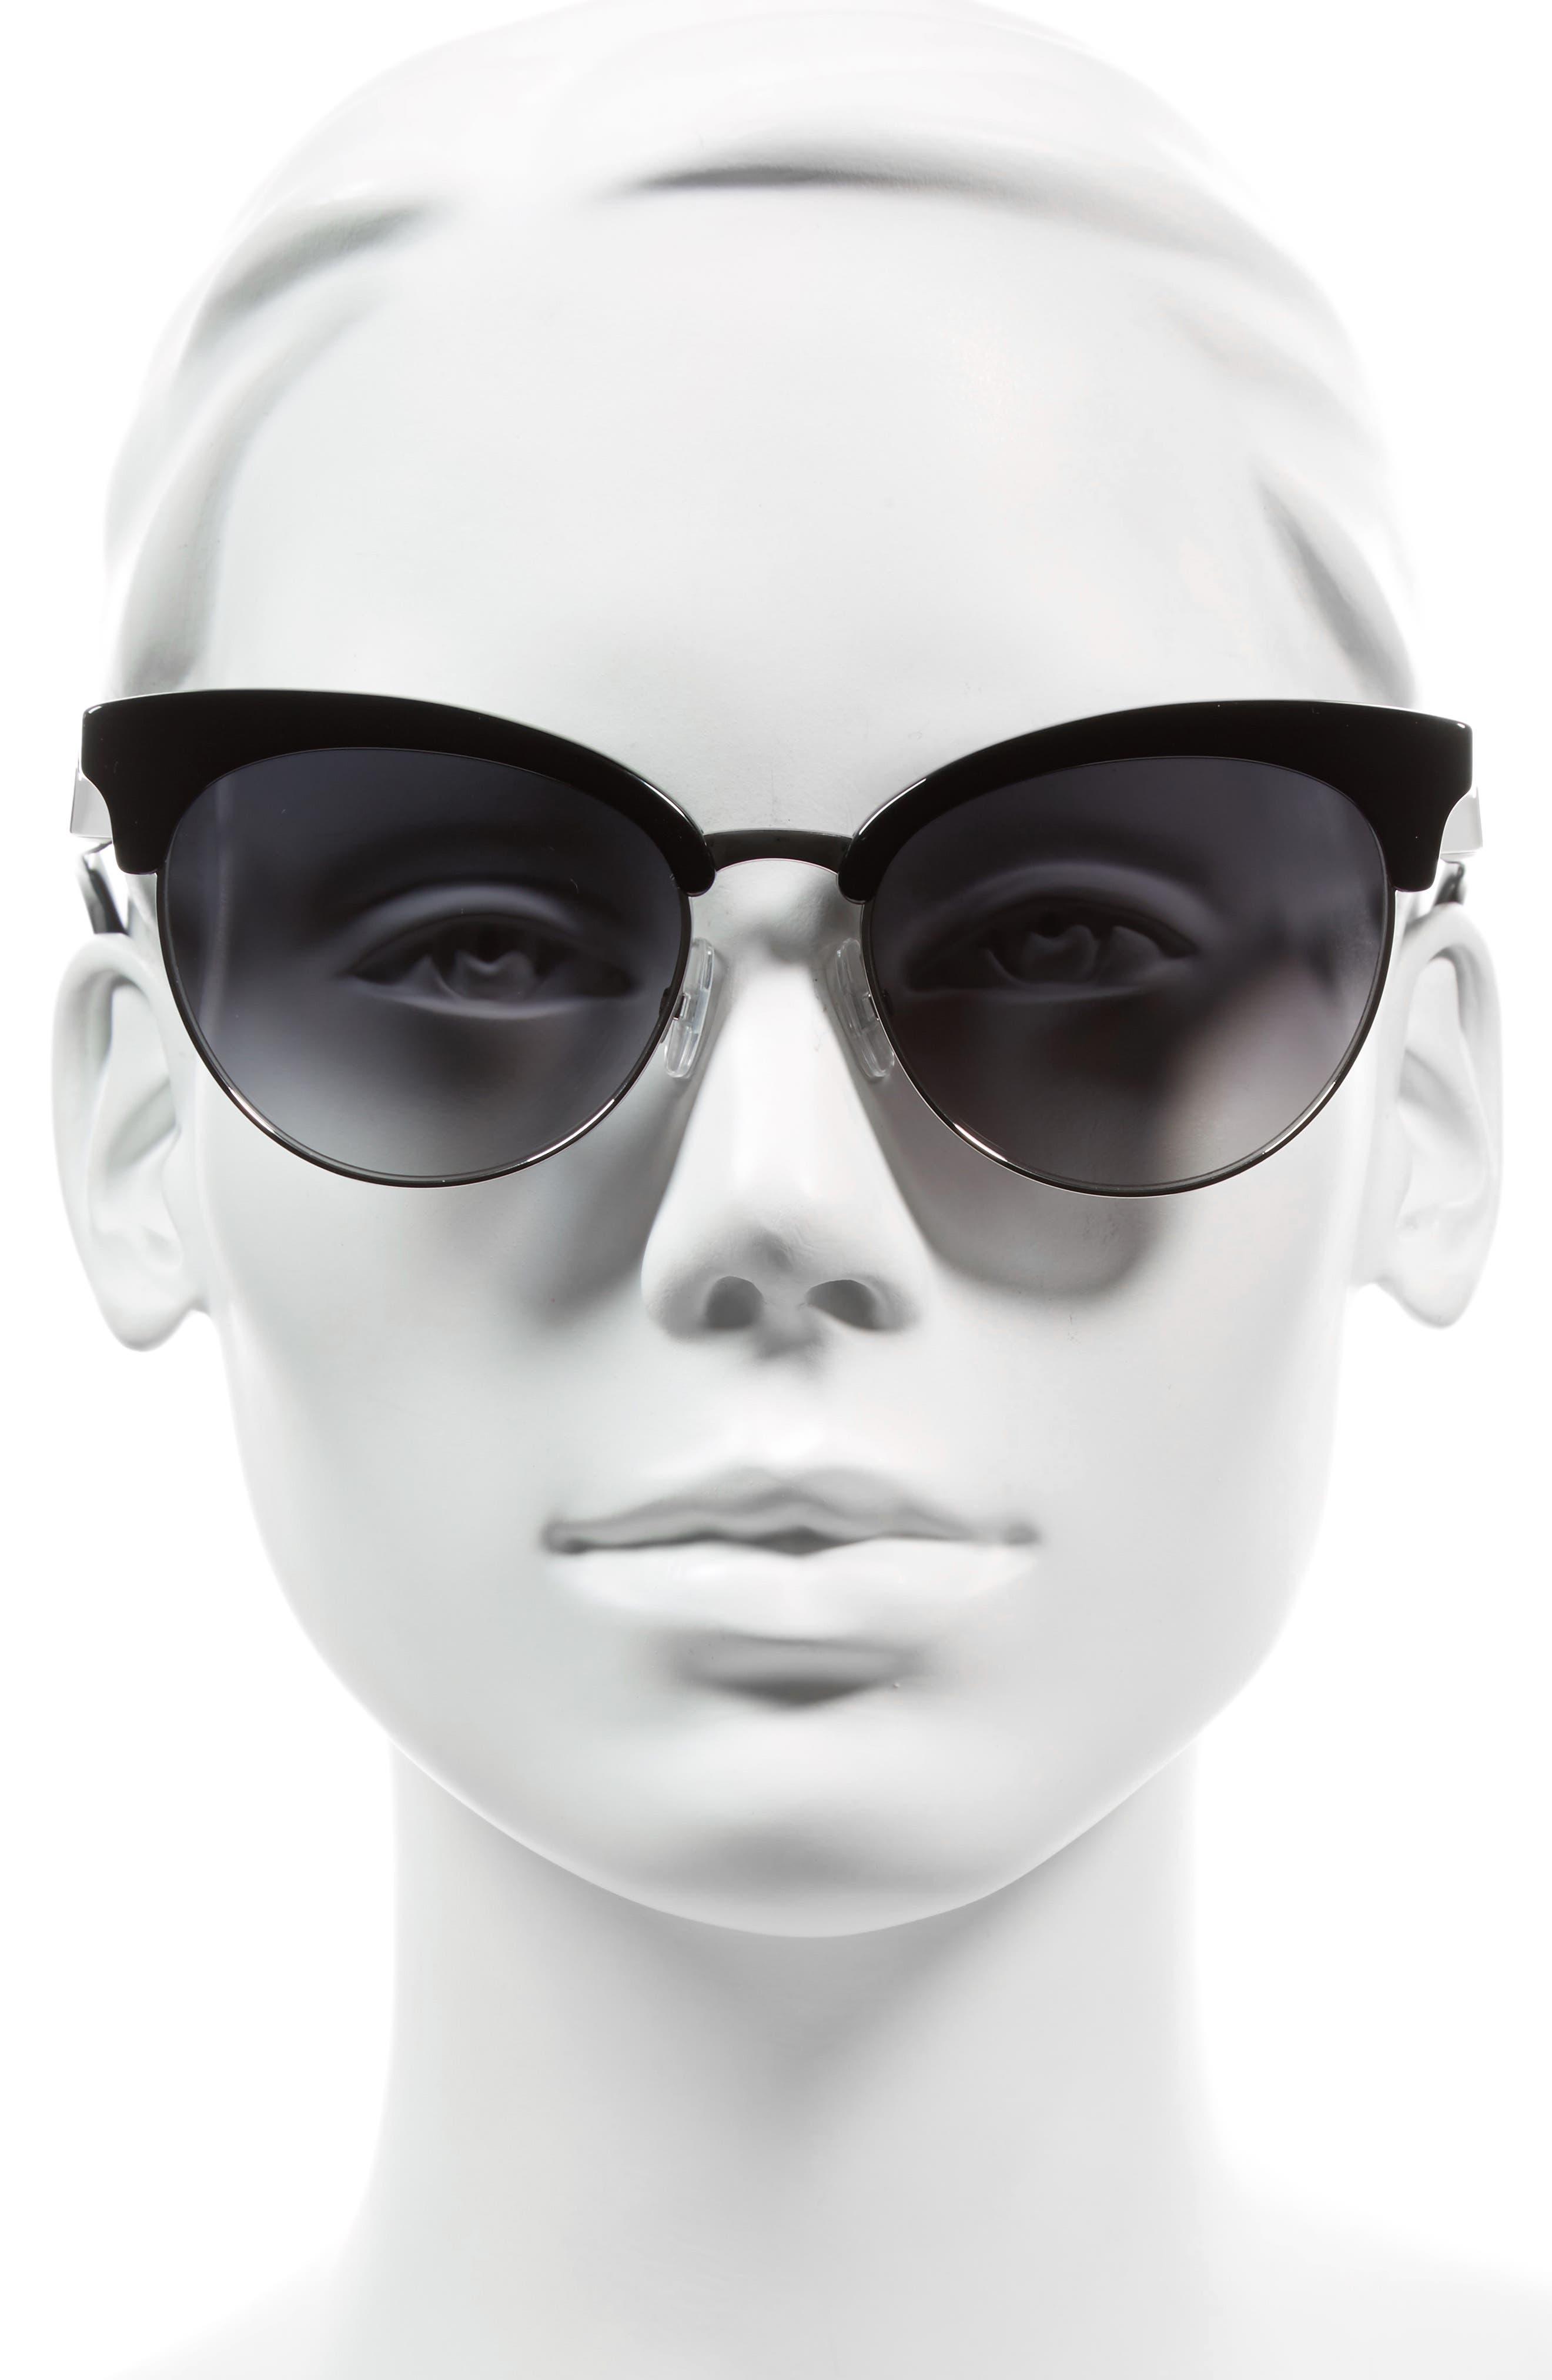 55mm Gradient Lens Cat Eye Sunglasses,                             Alternate thumbnail 2, color,                             001